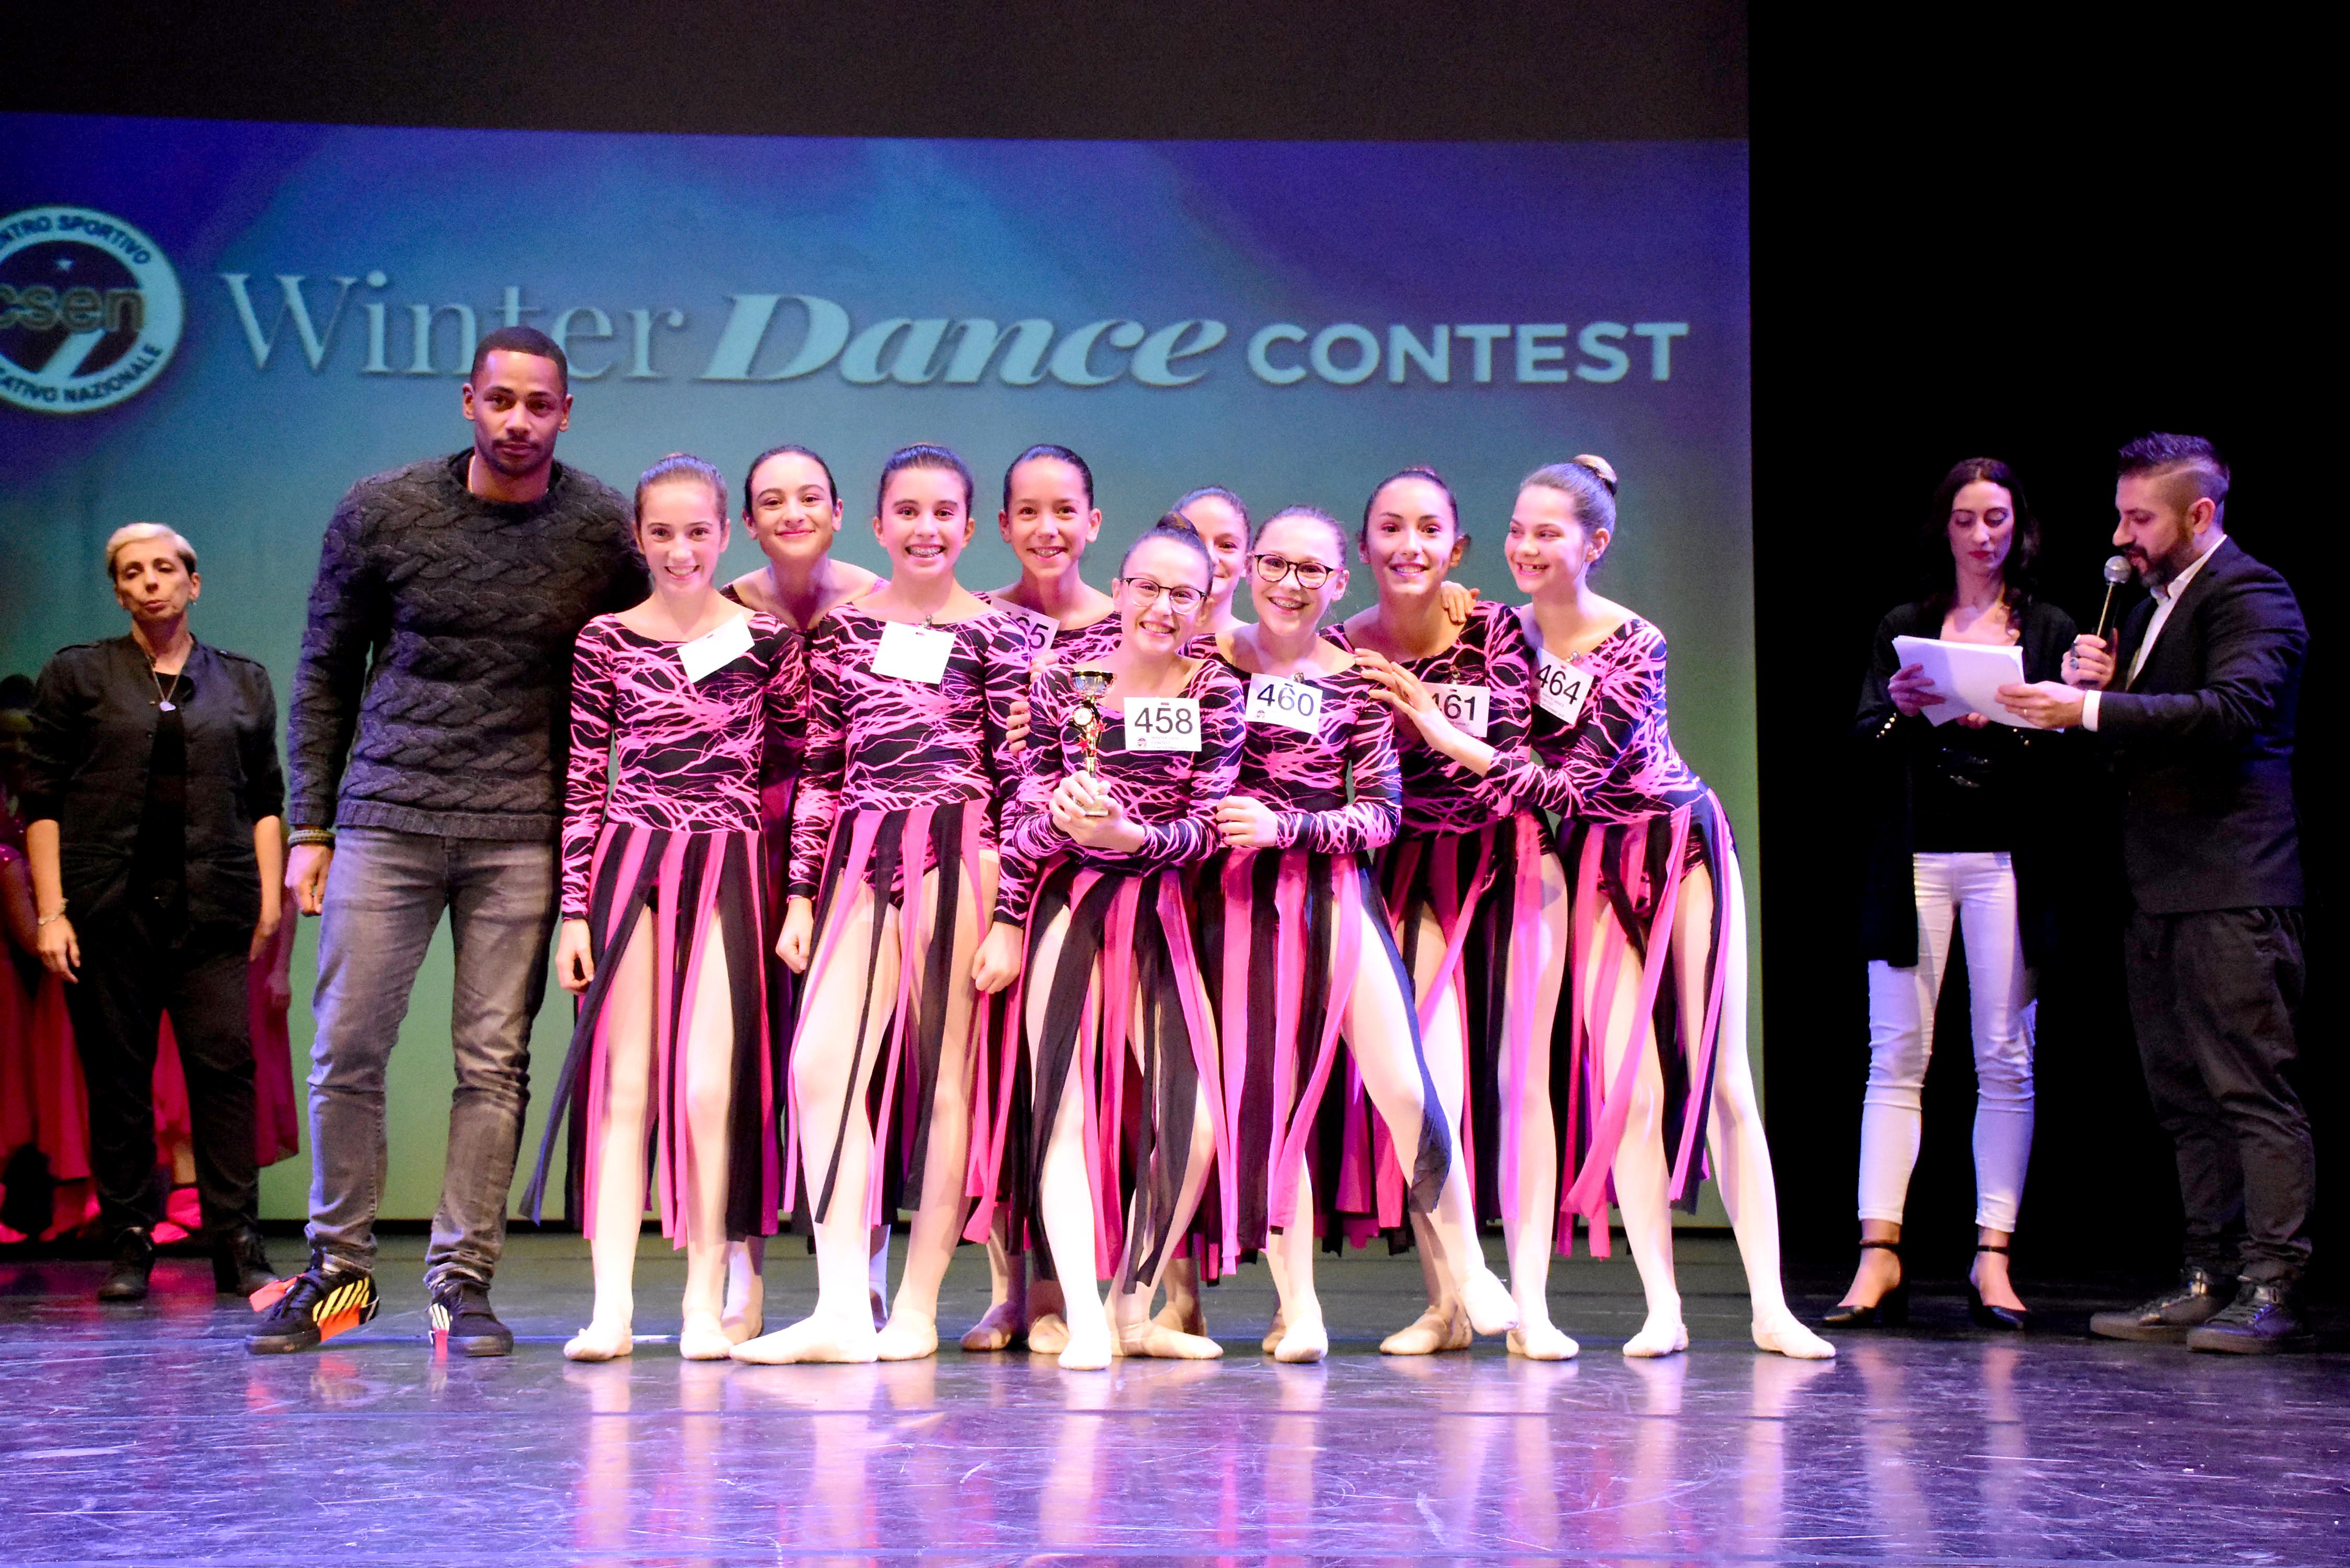 WINTER DANCE CONTEST